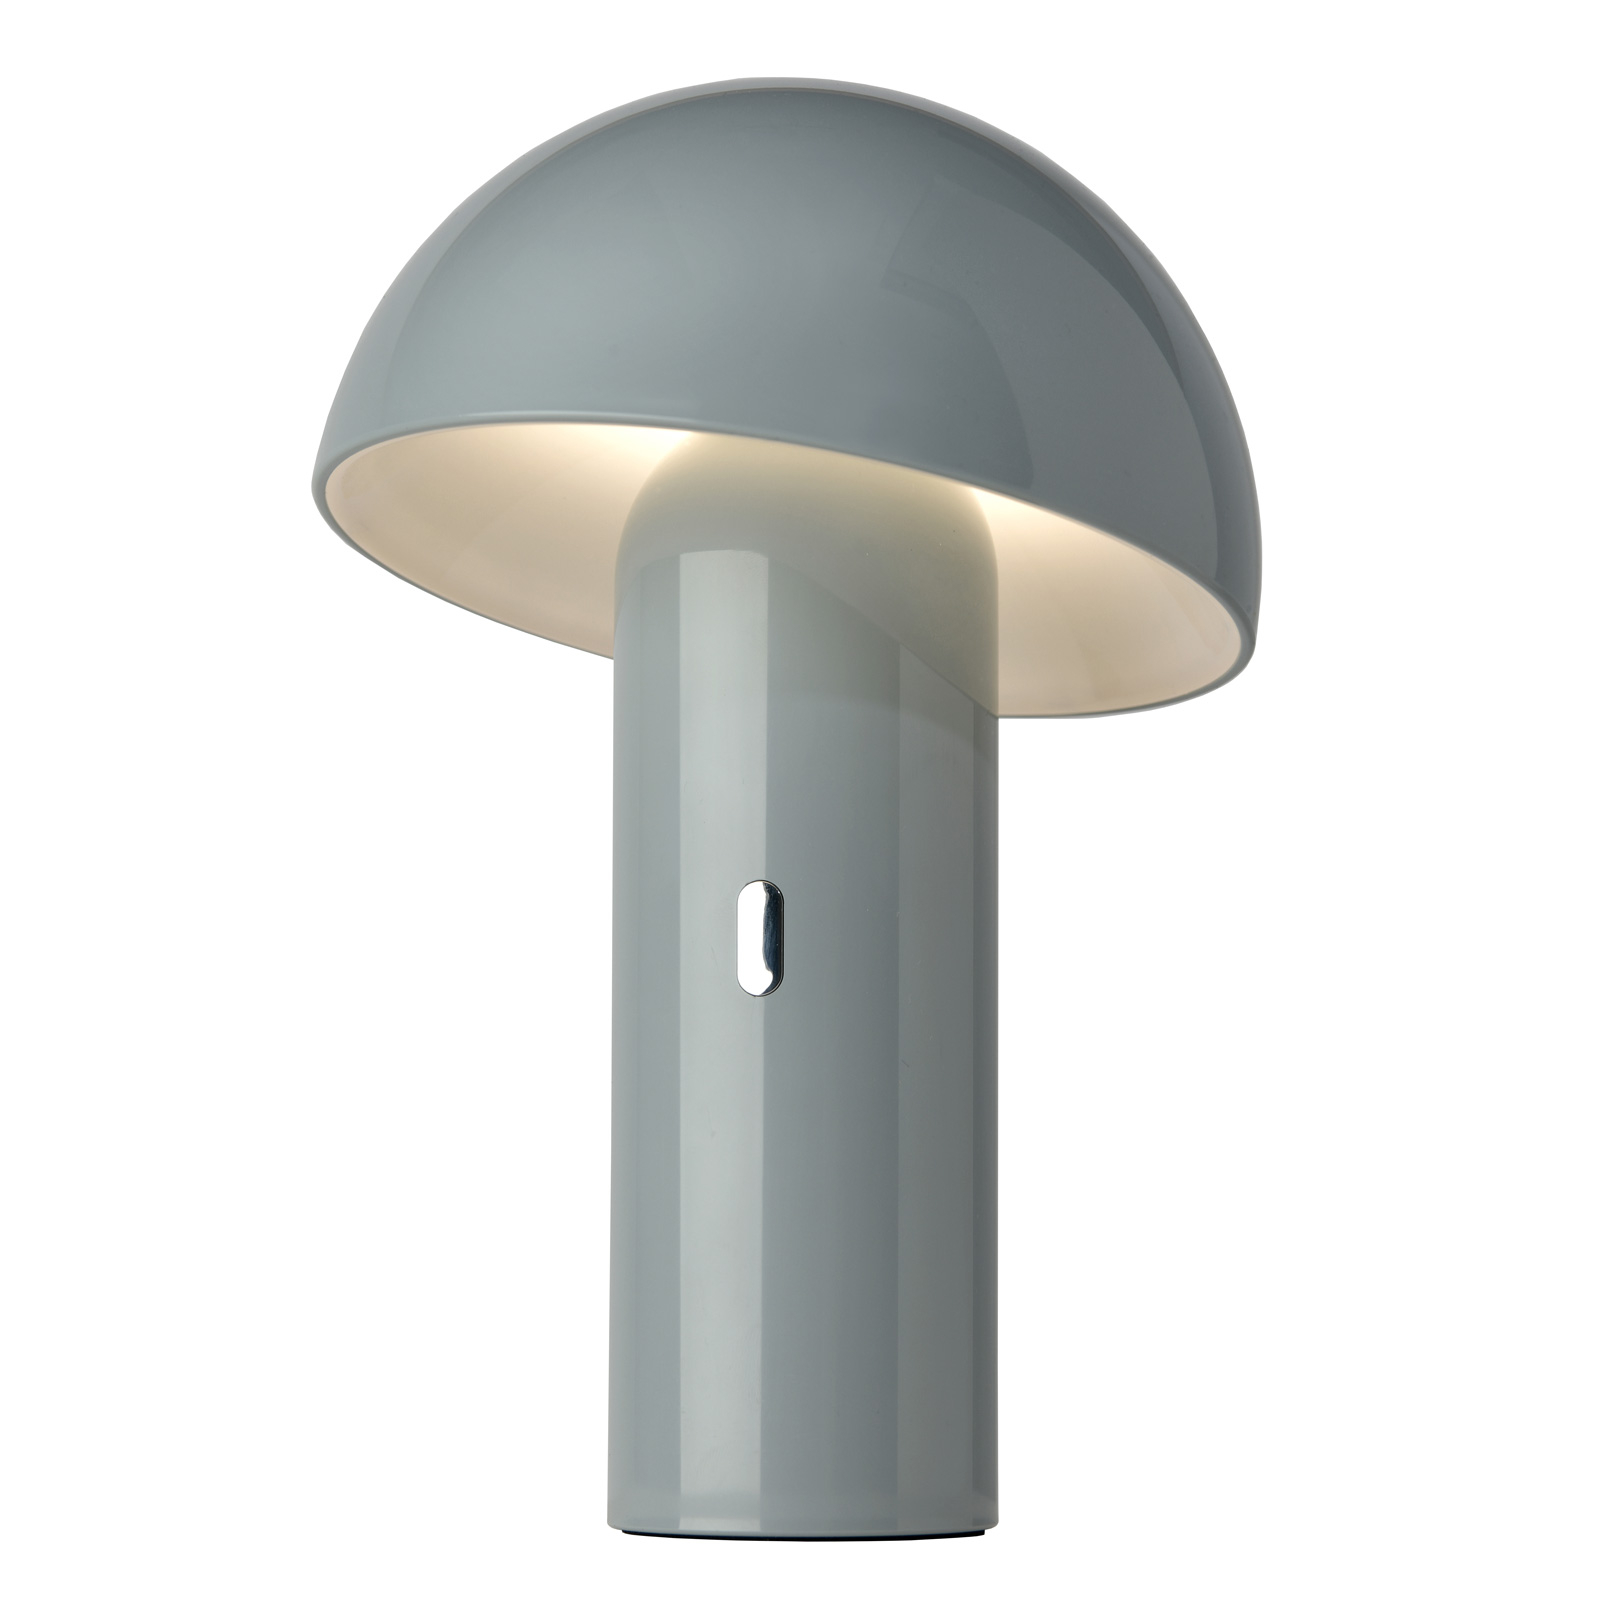 Lampada da tavolo LED Svamp a batteria, grigia